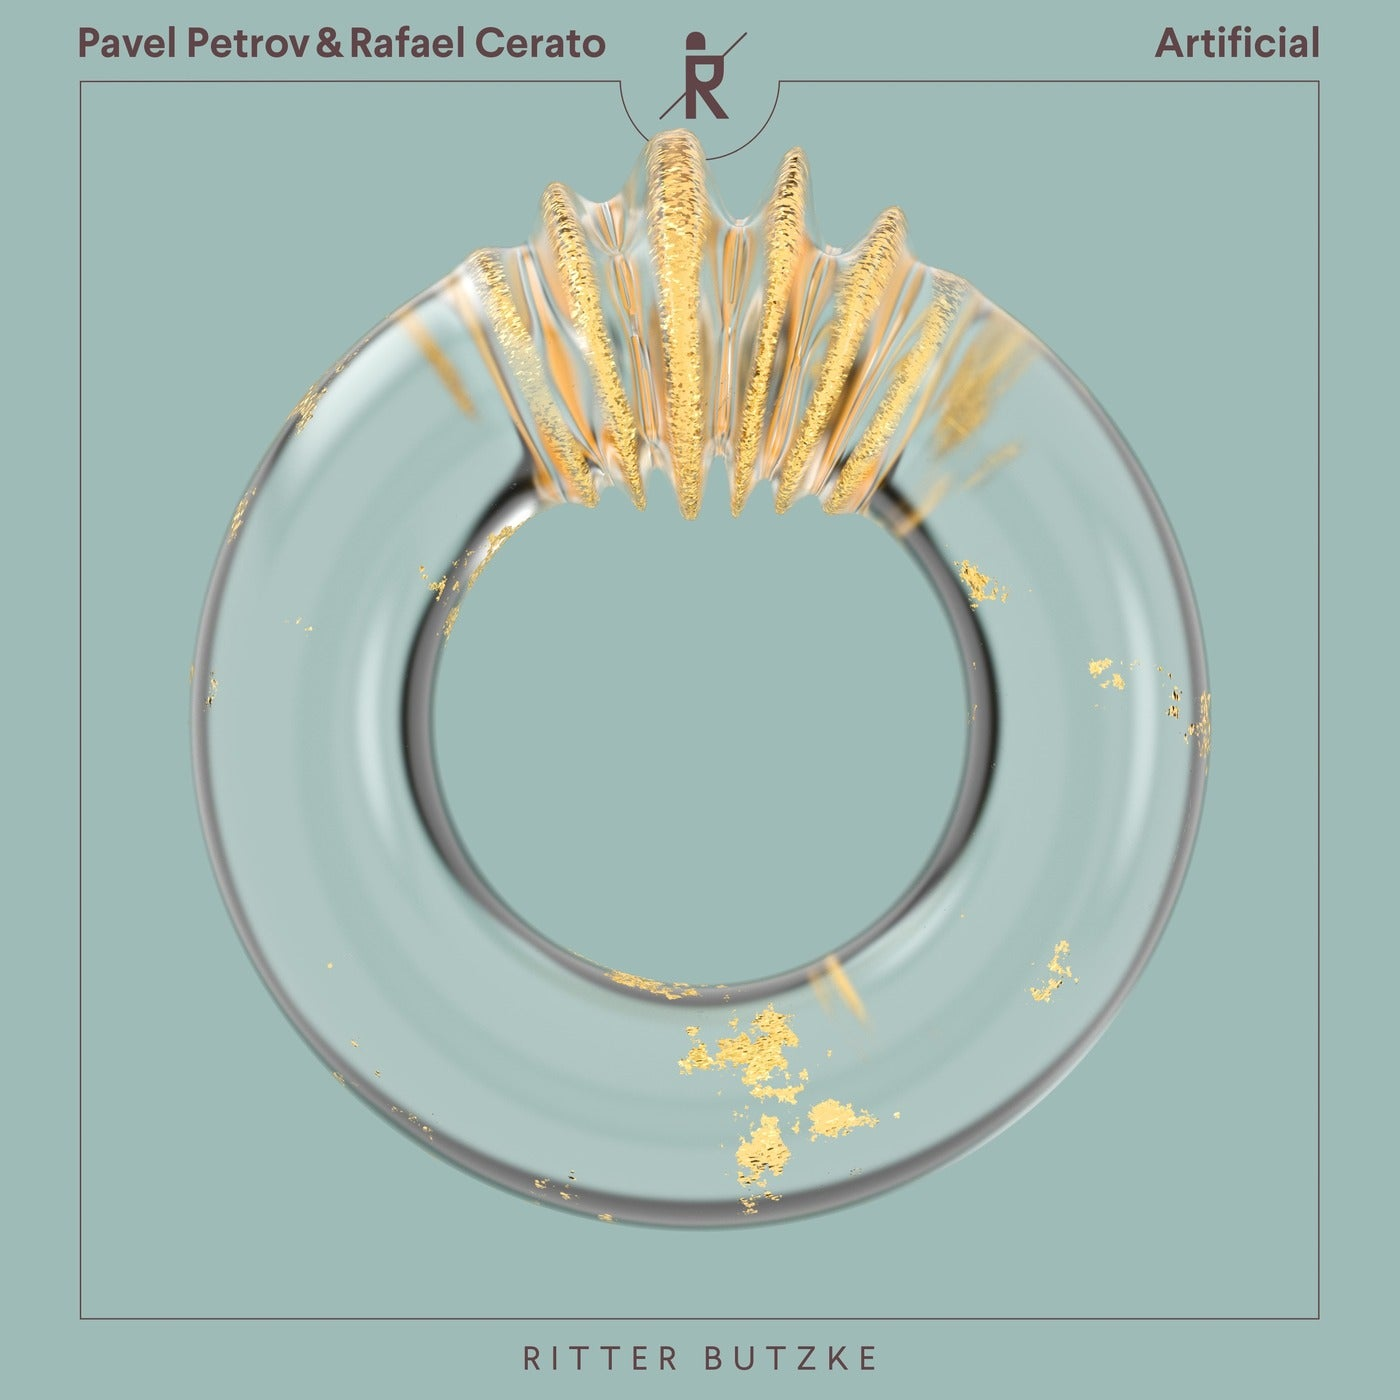 Artificial (Original Mix)